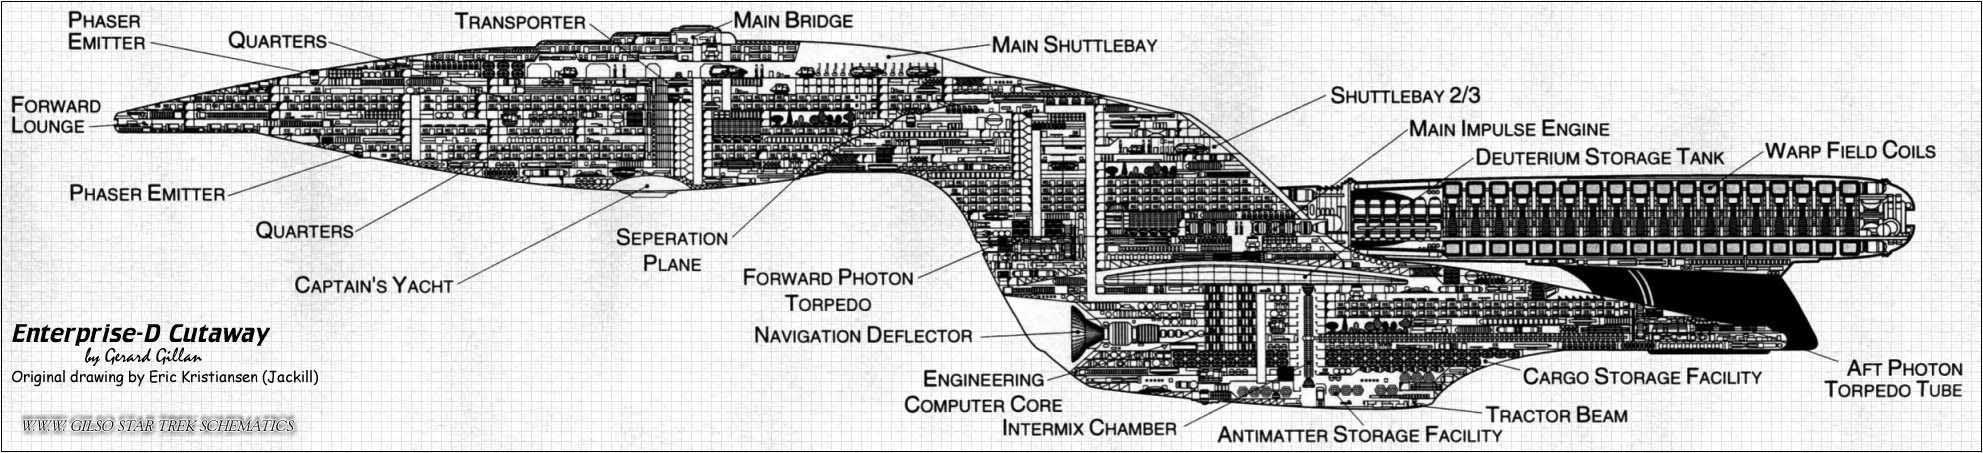 star trek photon torpedo diagrams - Google Search   Star Trek ...